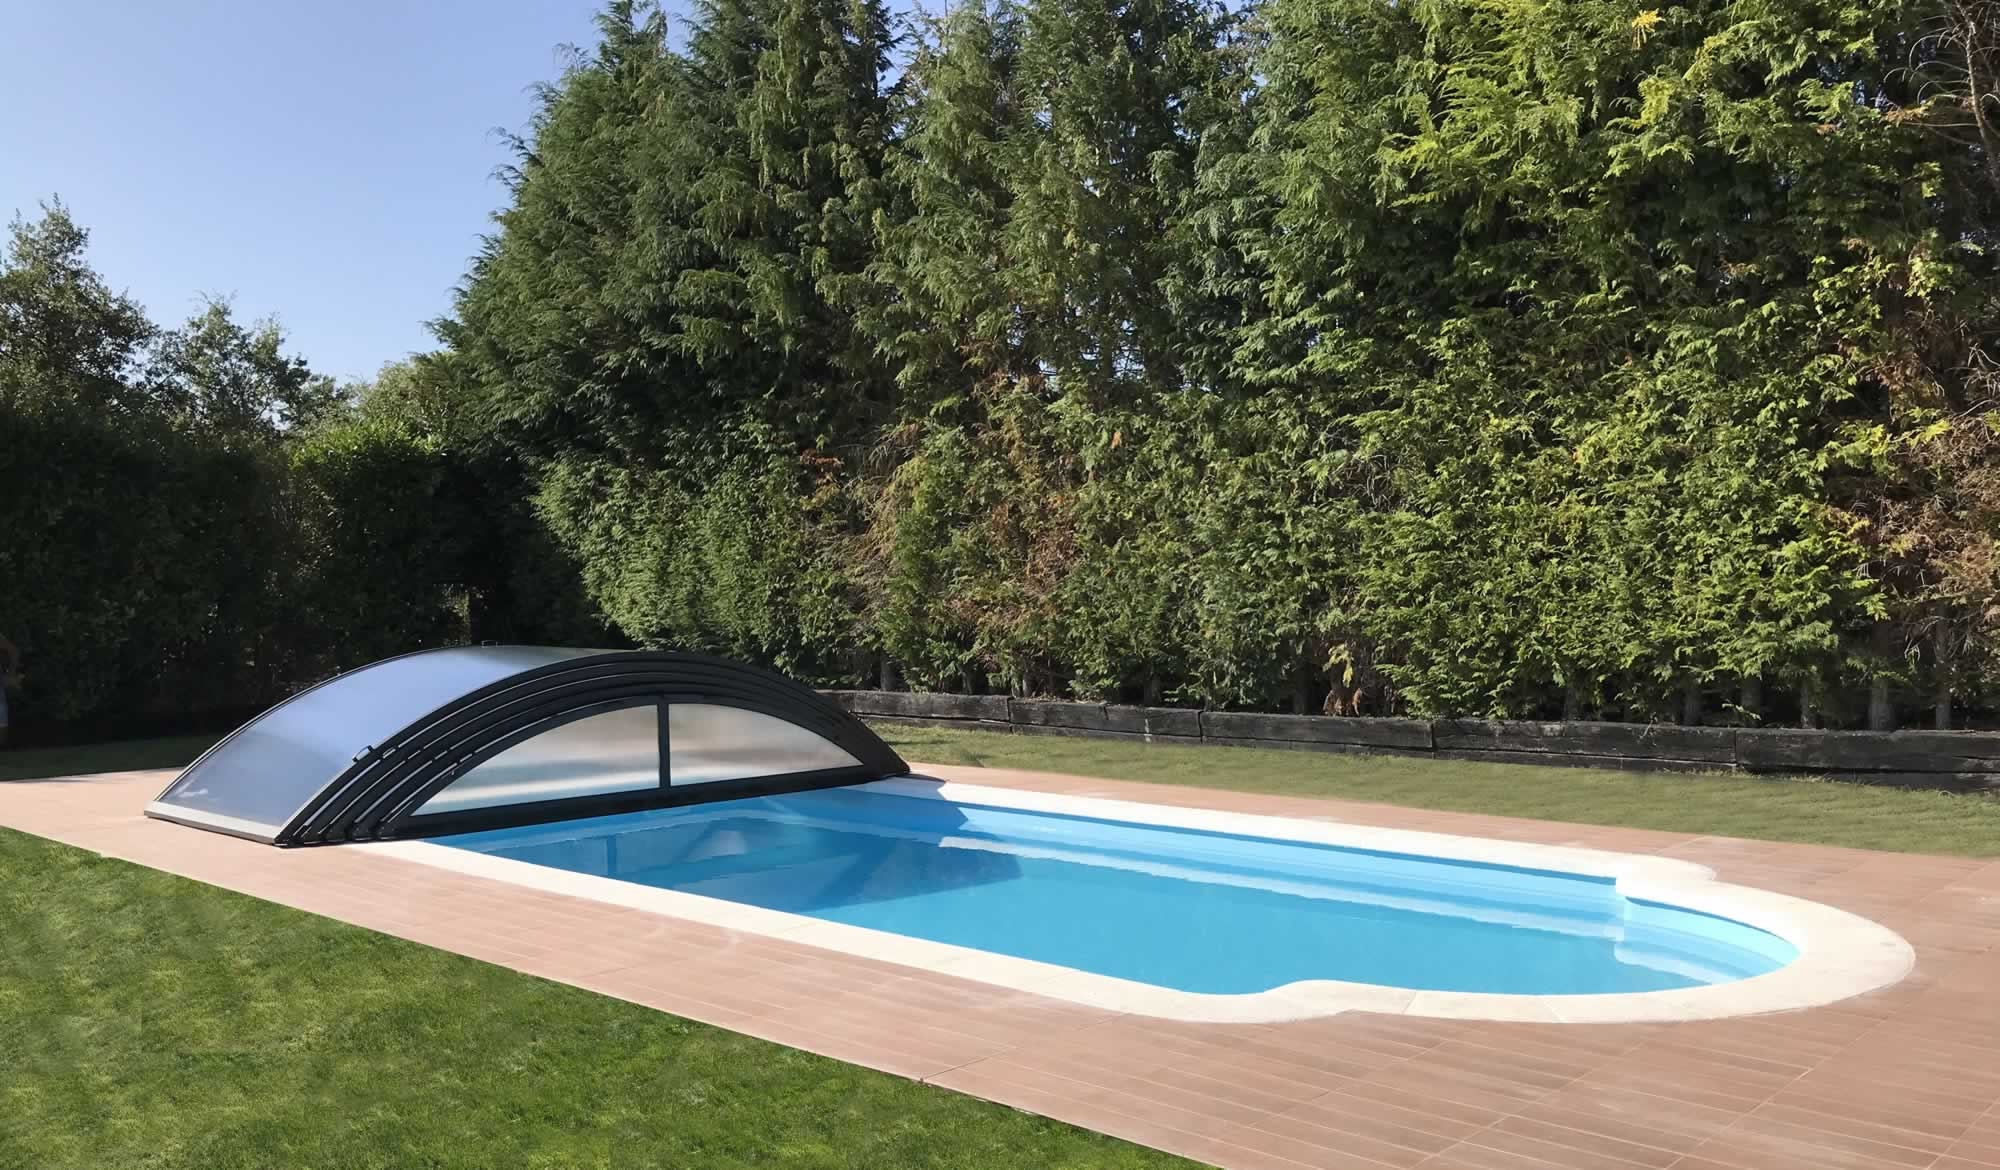 Cubierta para piscina teide en vitoria tecnyvan - Fabricantes de piscinas ...